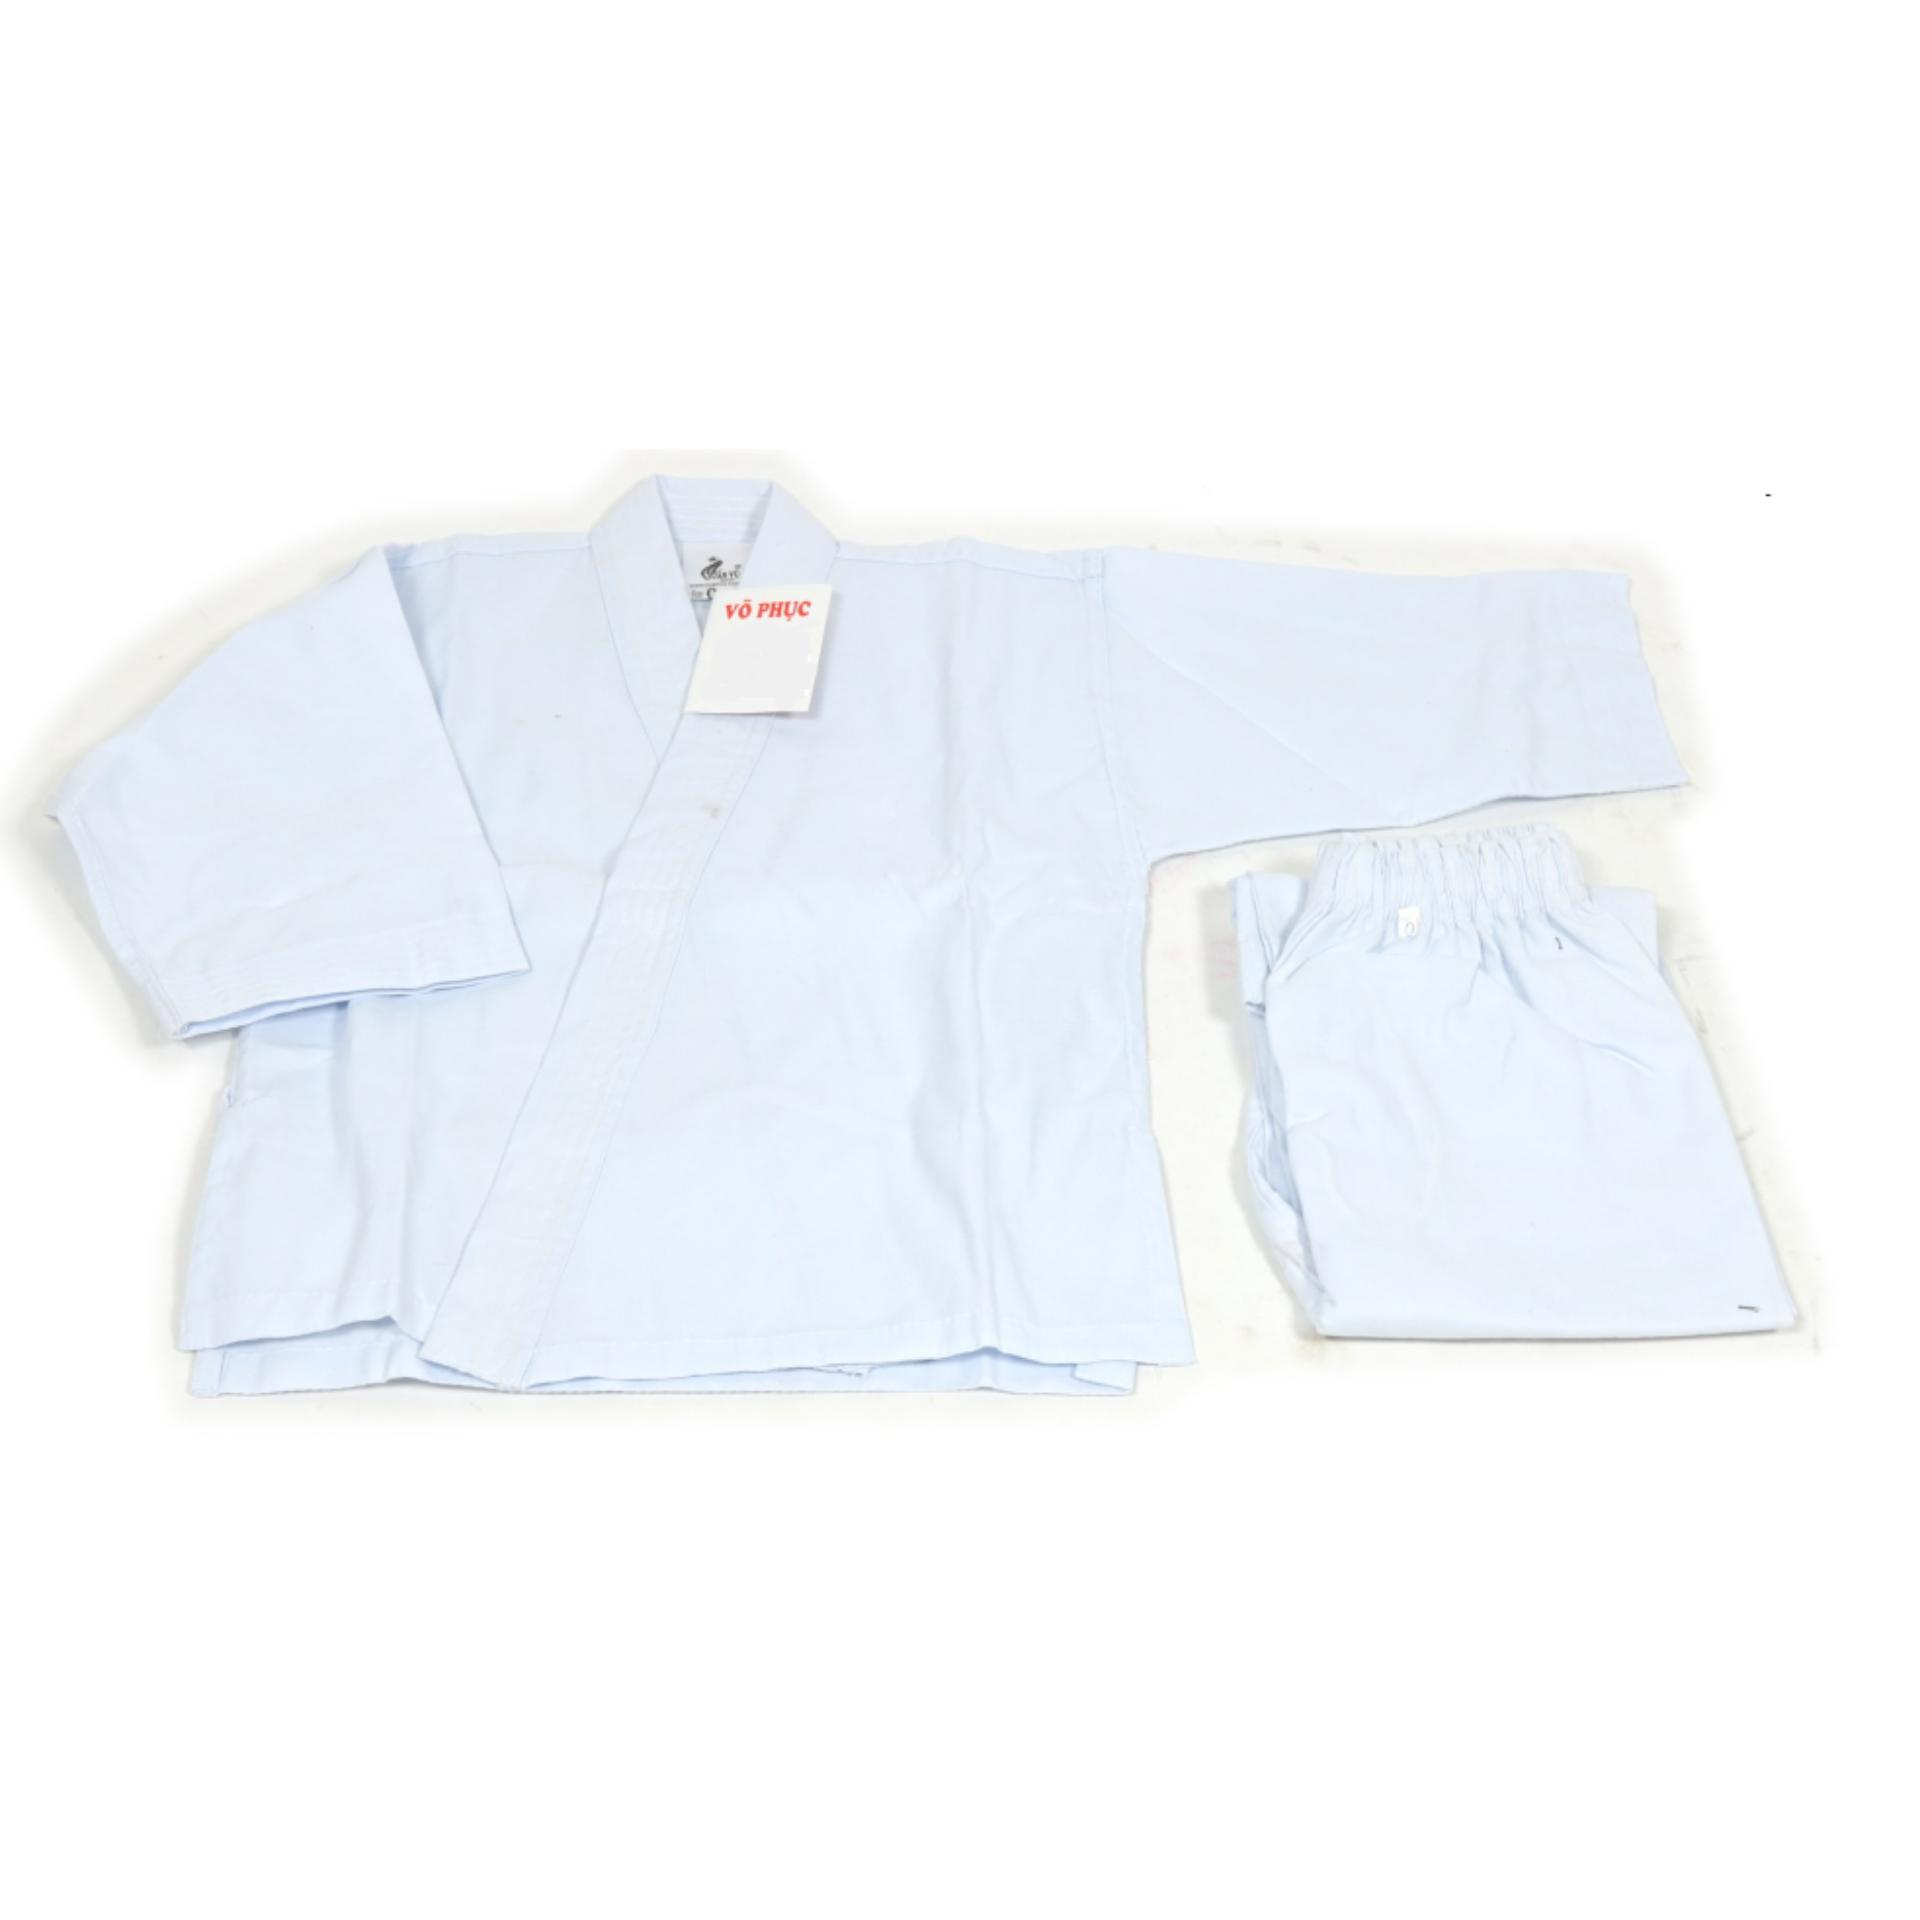 Võ phục quần áo Karate vải kaki